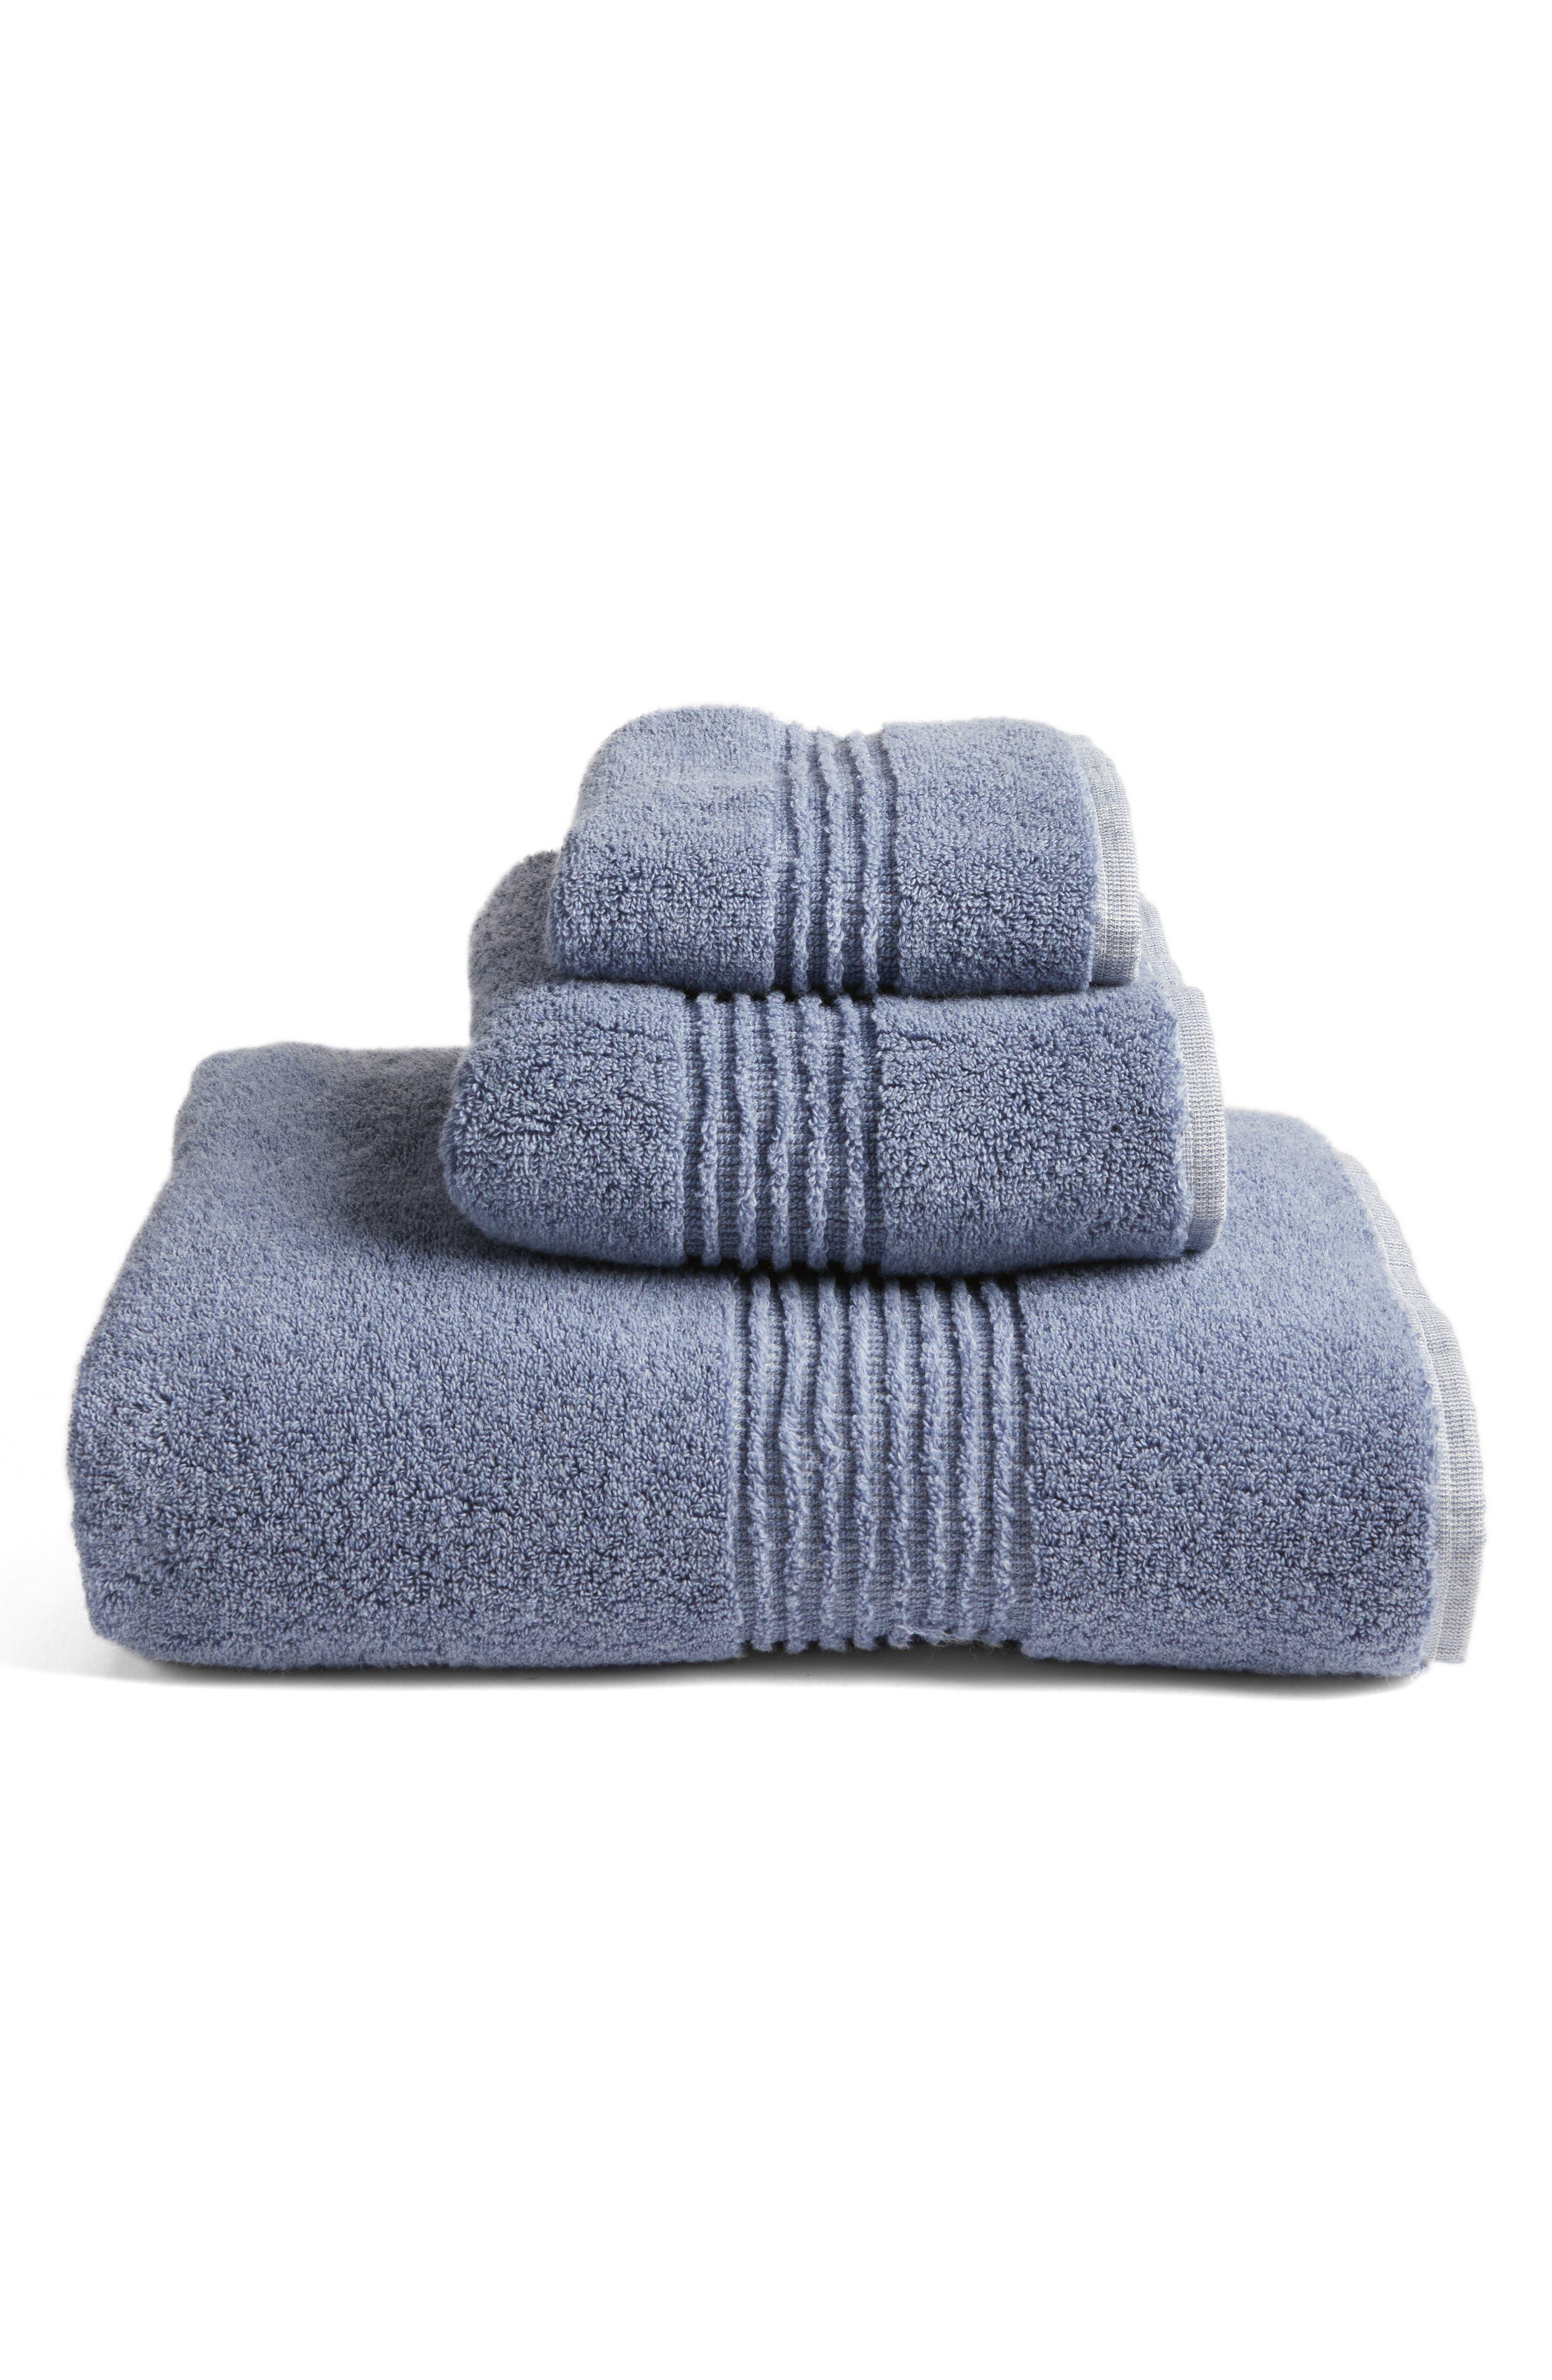 Organic Hydrocotton Bath Towel,                             Alternate thumbnail 3, color,                             Navy Sky